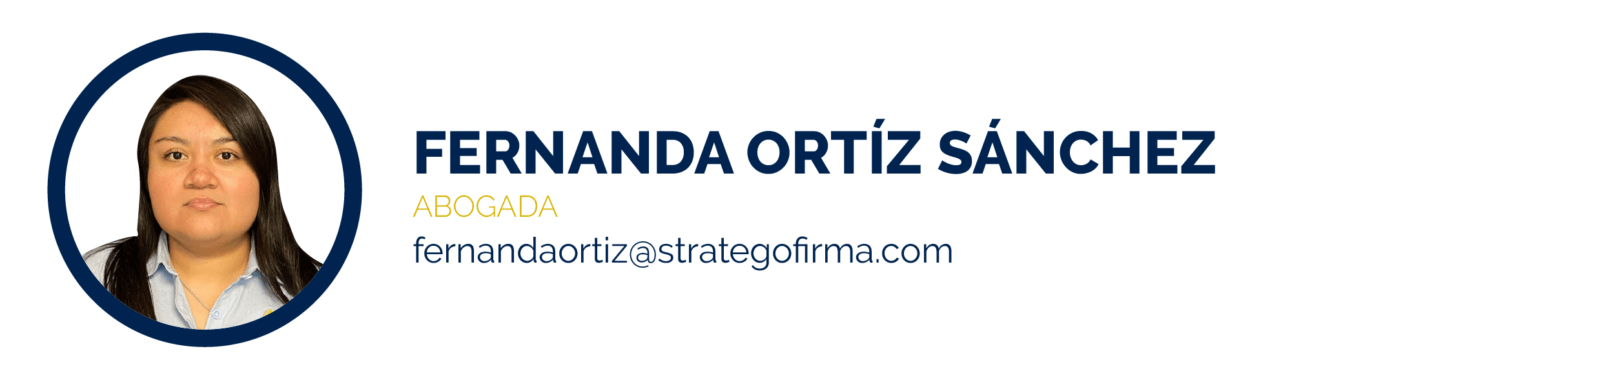 PERFIL_FERNANDA-ORTIZ.png